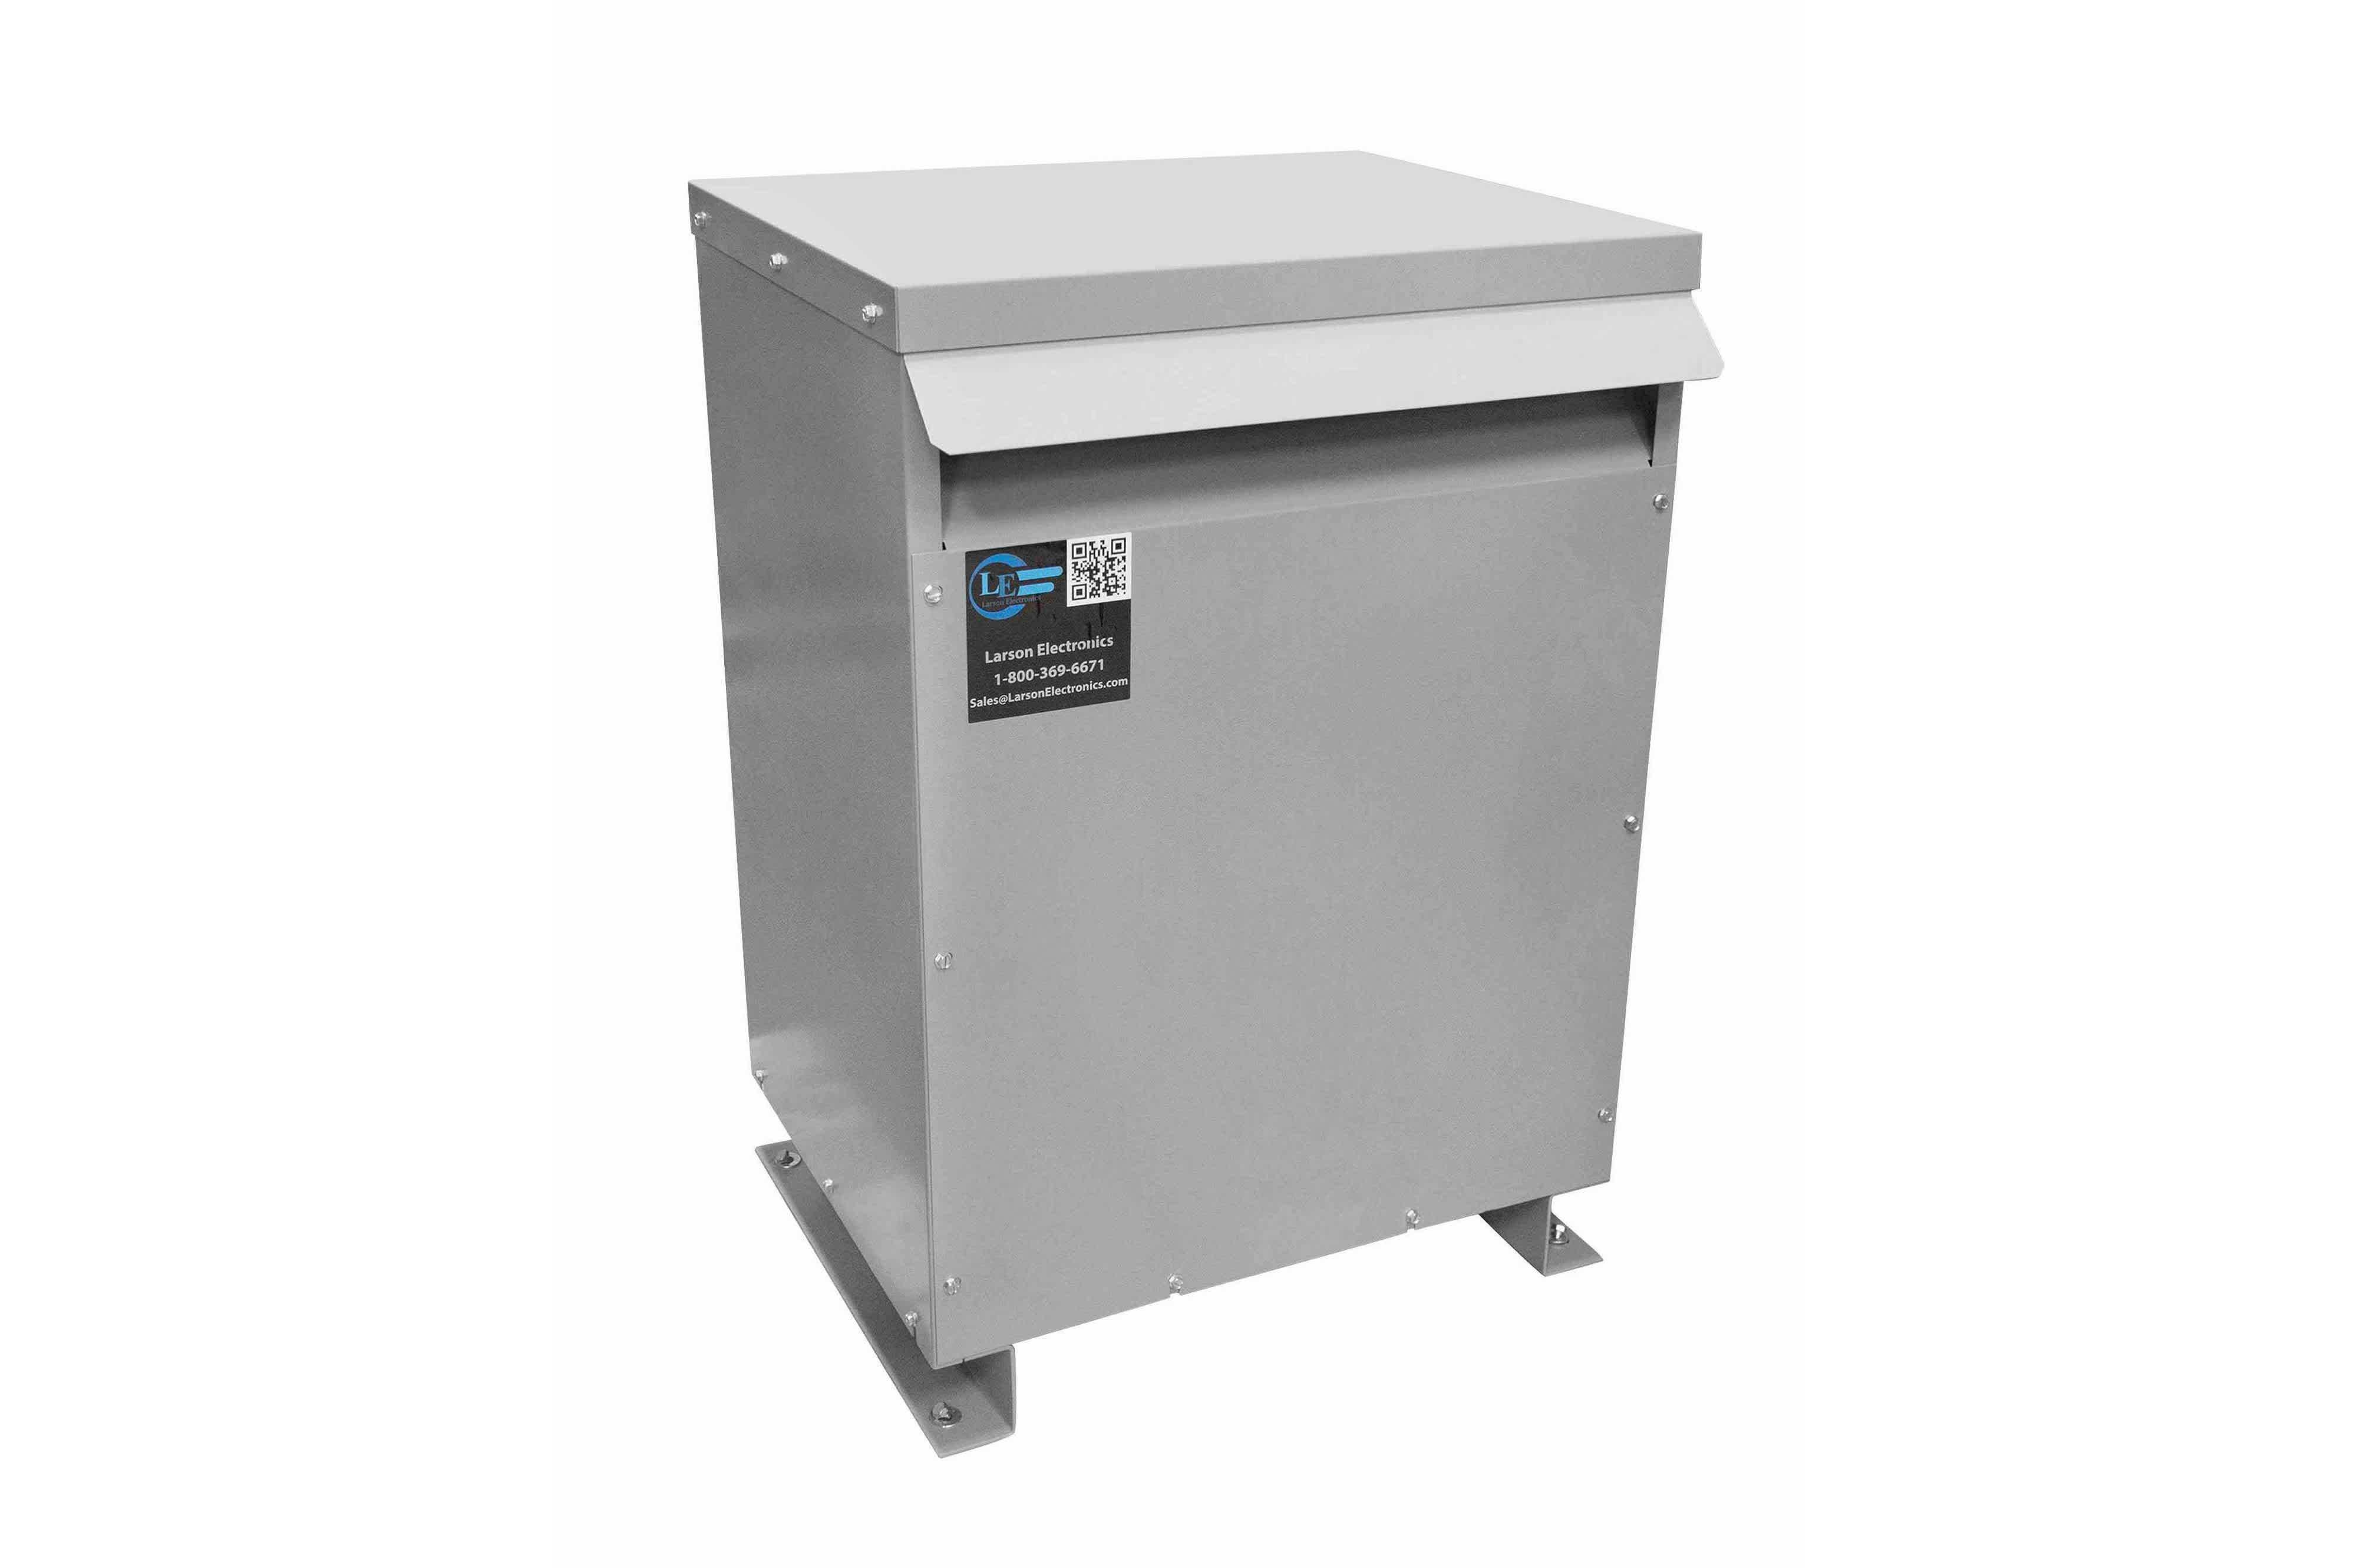 167 kVA 3PH Isolation Transformer, 575V Wye Primary, 400Y/231 Wye-N Secondary, N3R, Ventilated, 60 Hz